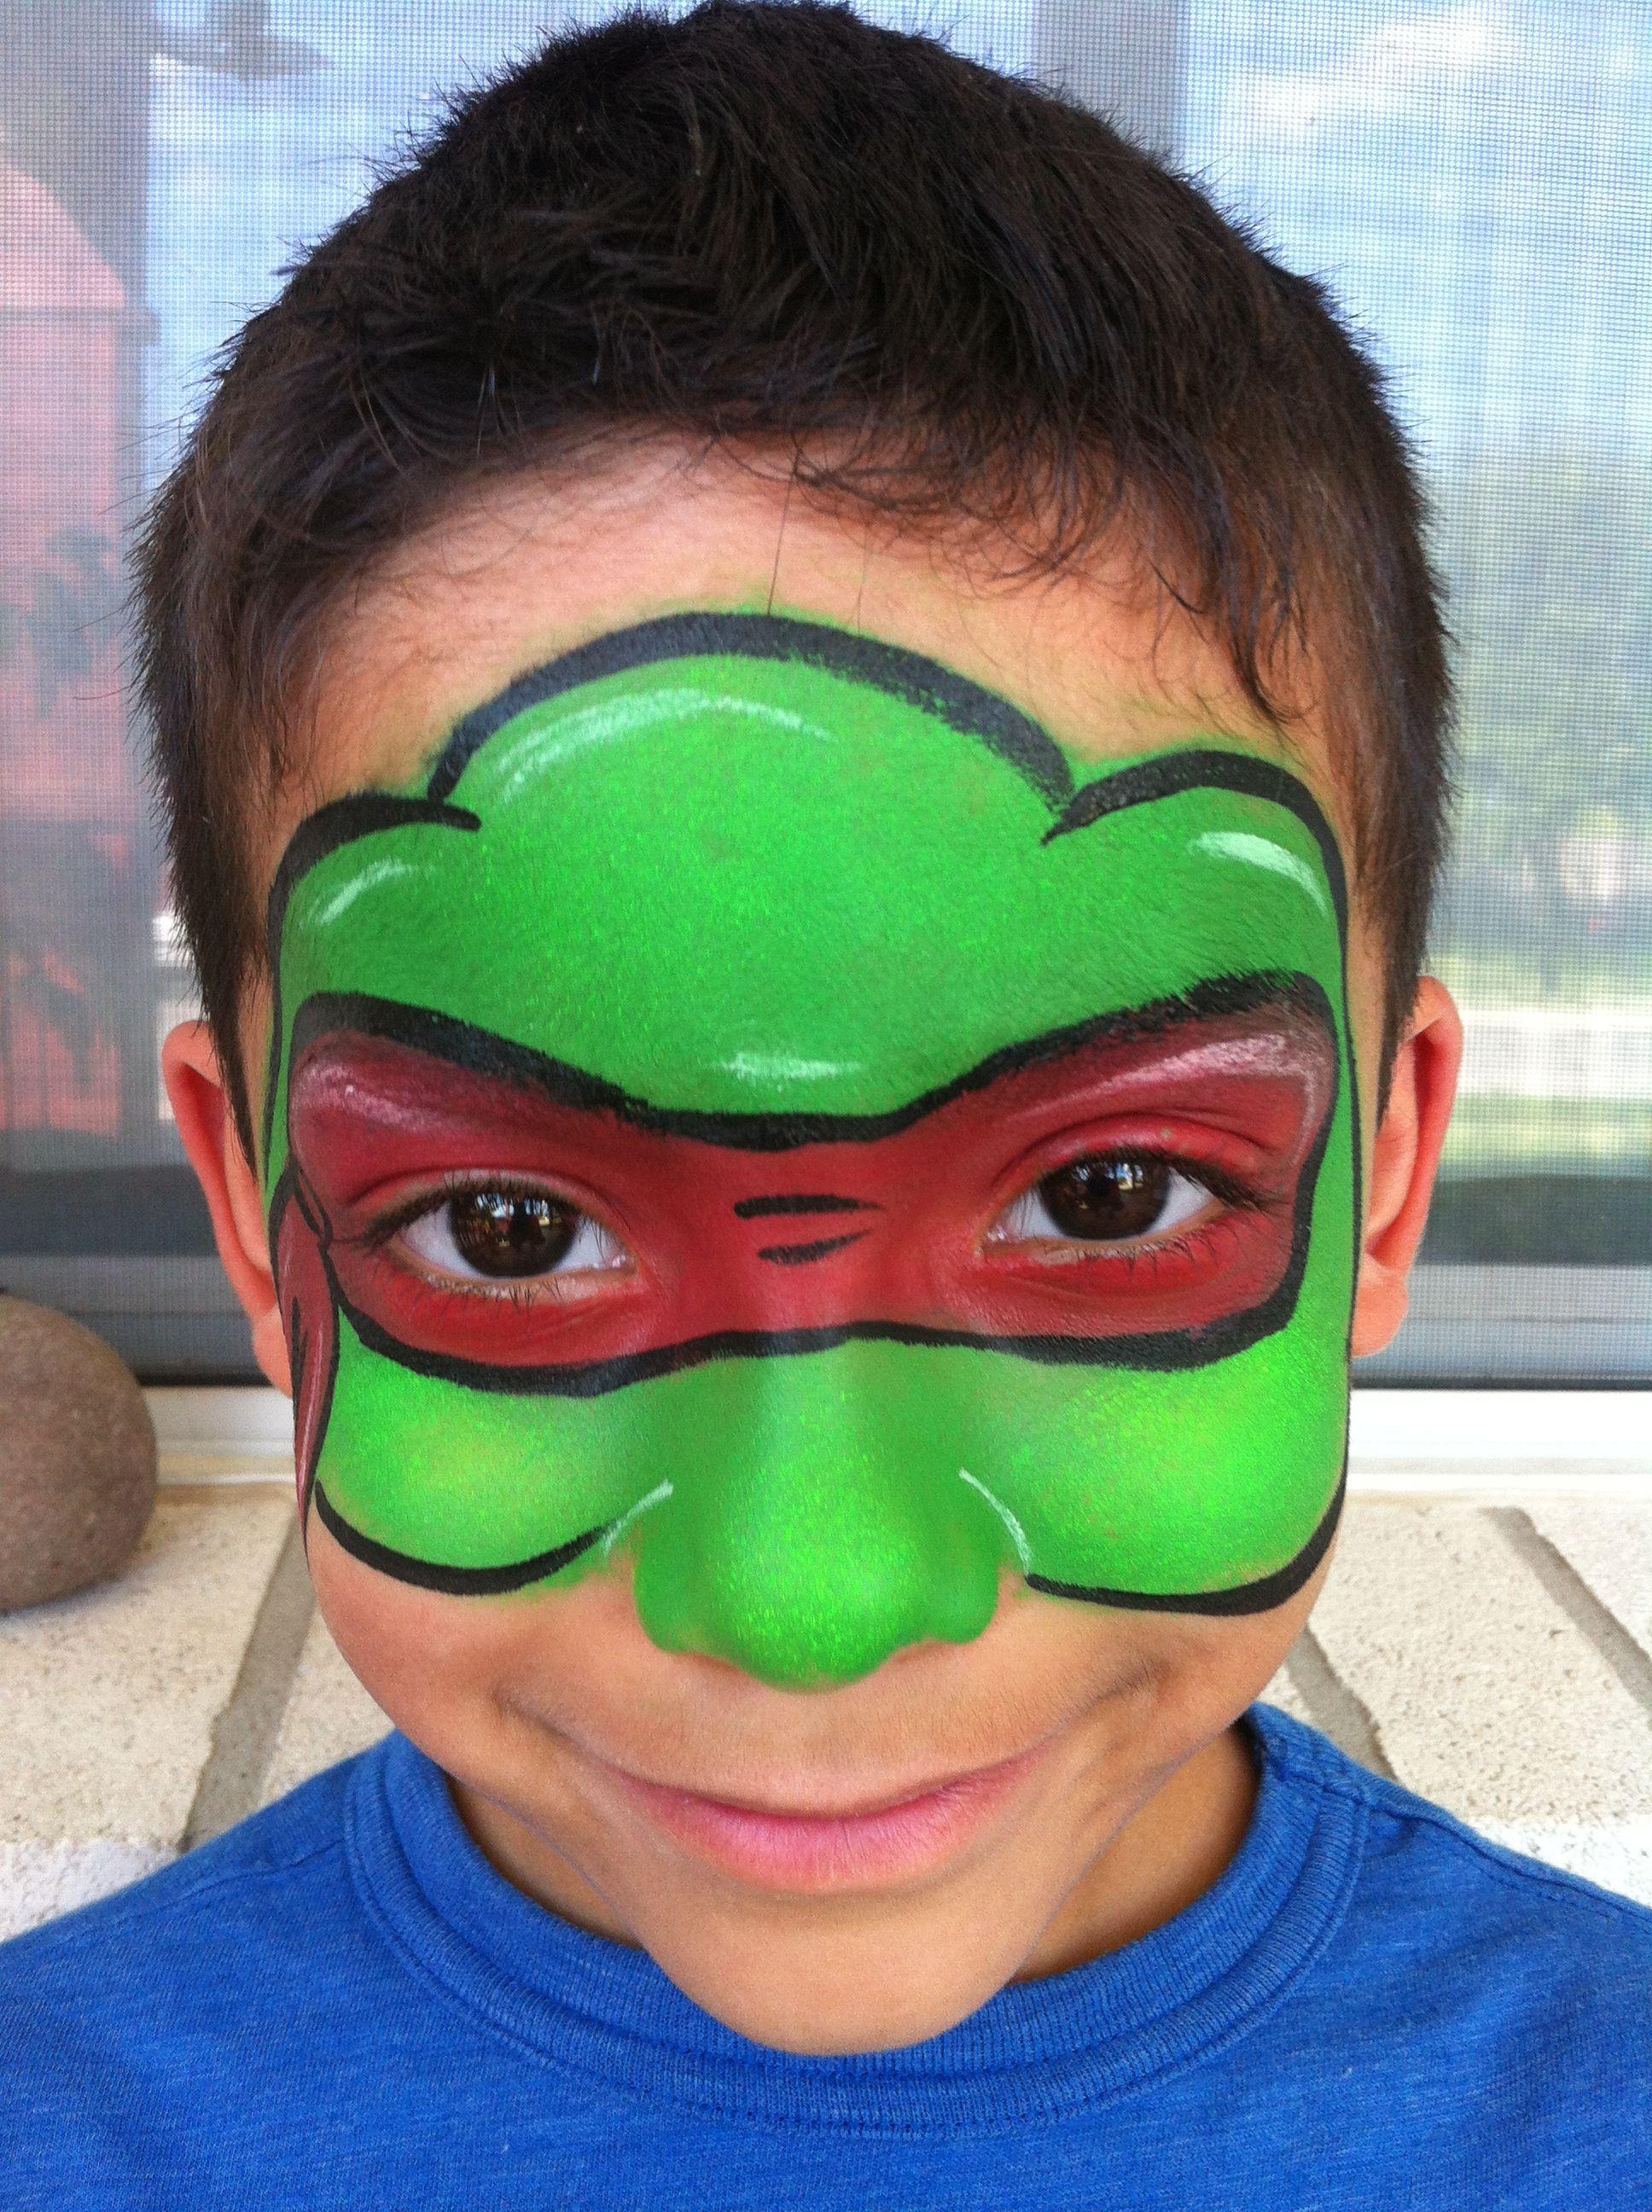 ninja turtle face paint face painting pinterest kinder schminken kinderschminken und basteln. Black Bedroom Furniture Sets. Home Design Ideas